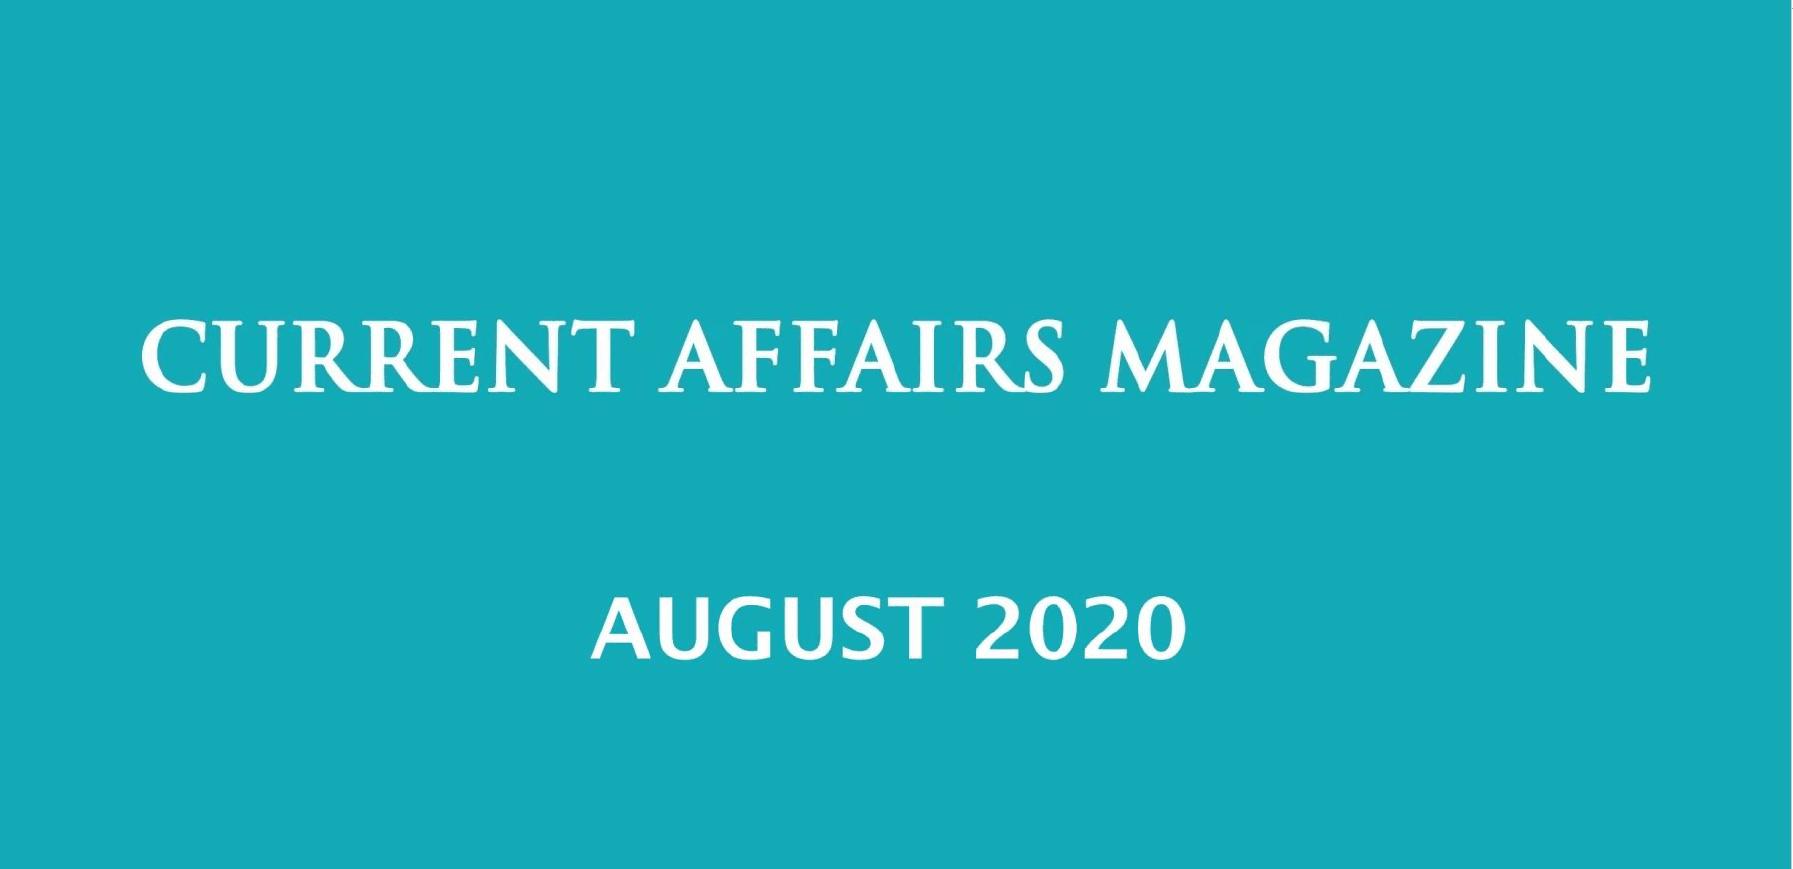 Current Affairs August 2020 iasparliament